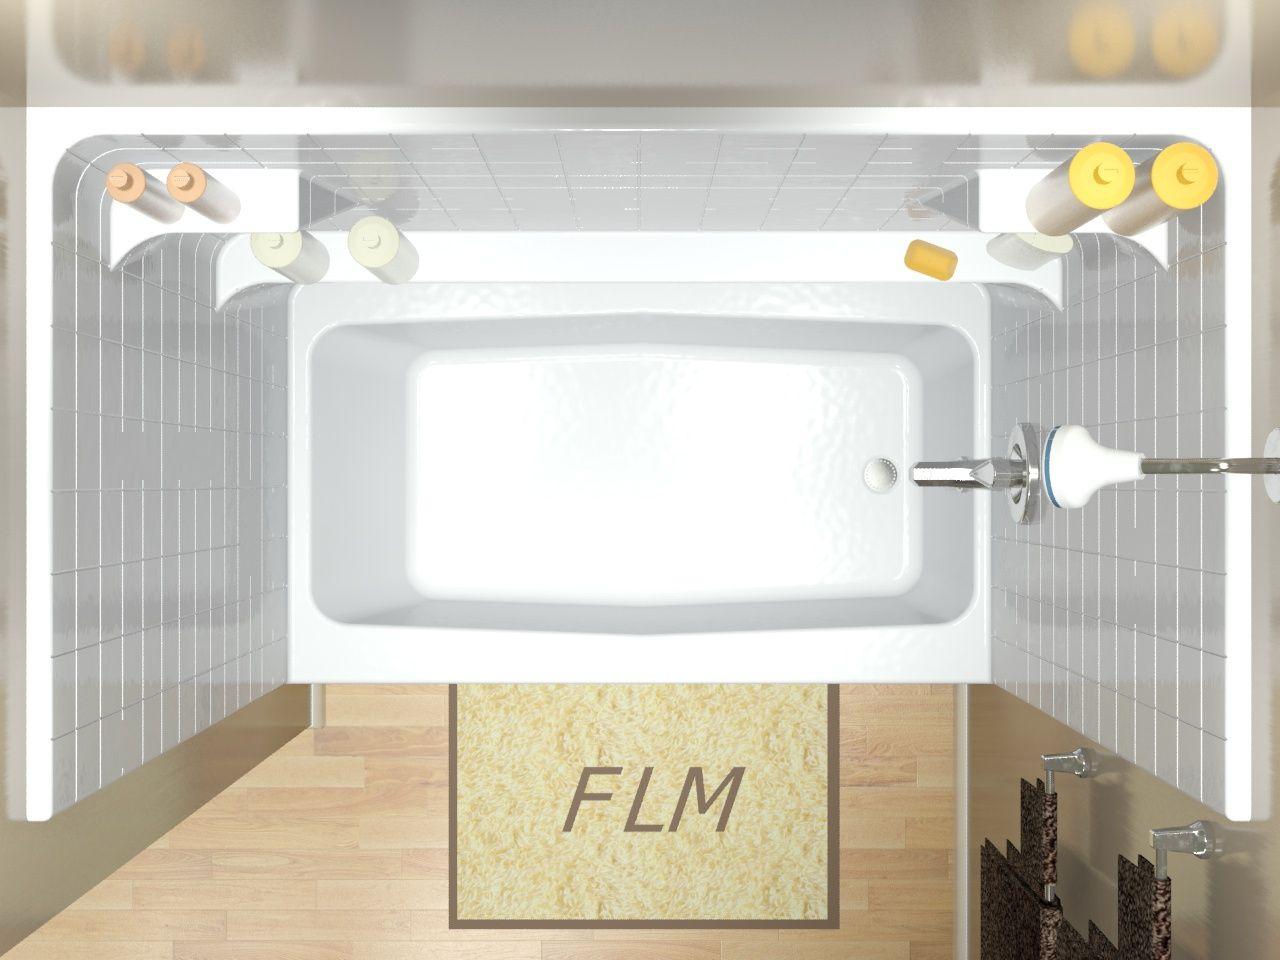 TT 603677 or 79 L | Diamond Tub & Showers | Beach house | Pinterest ...